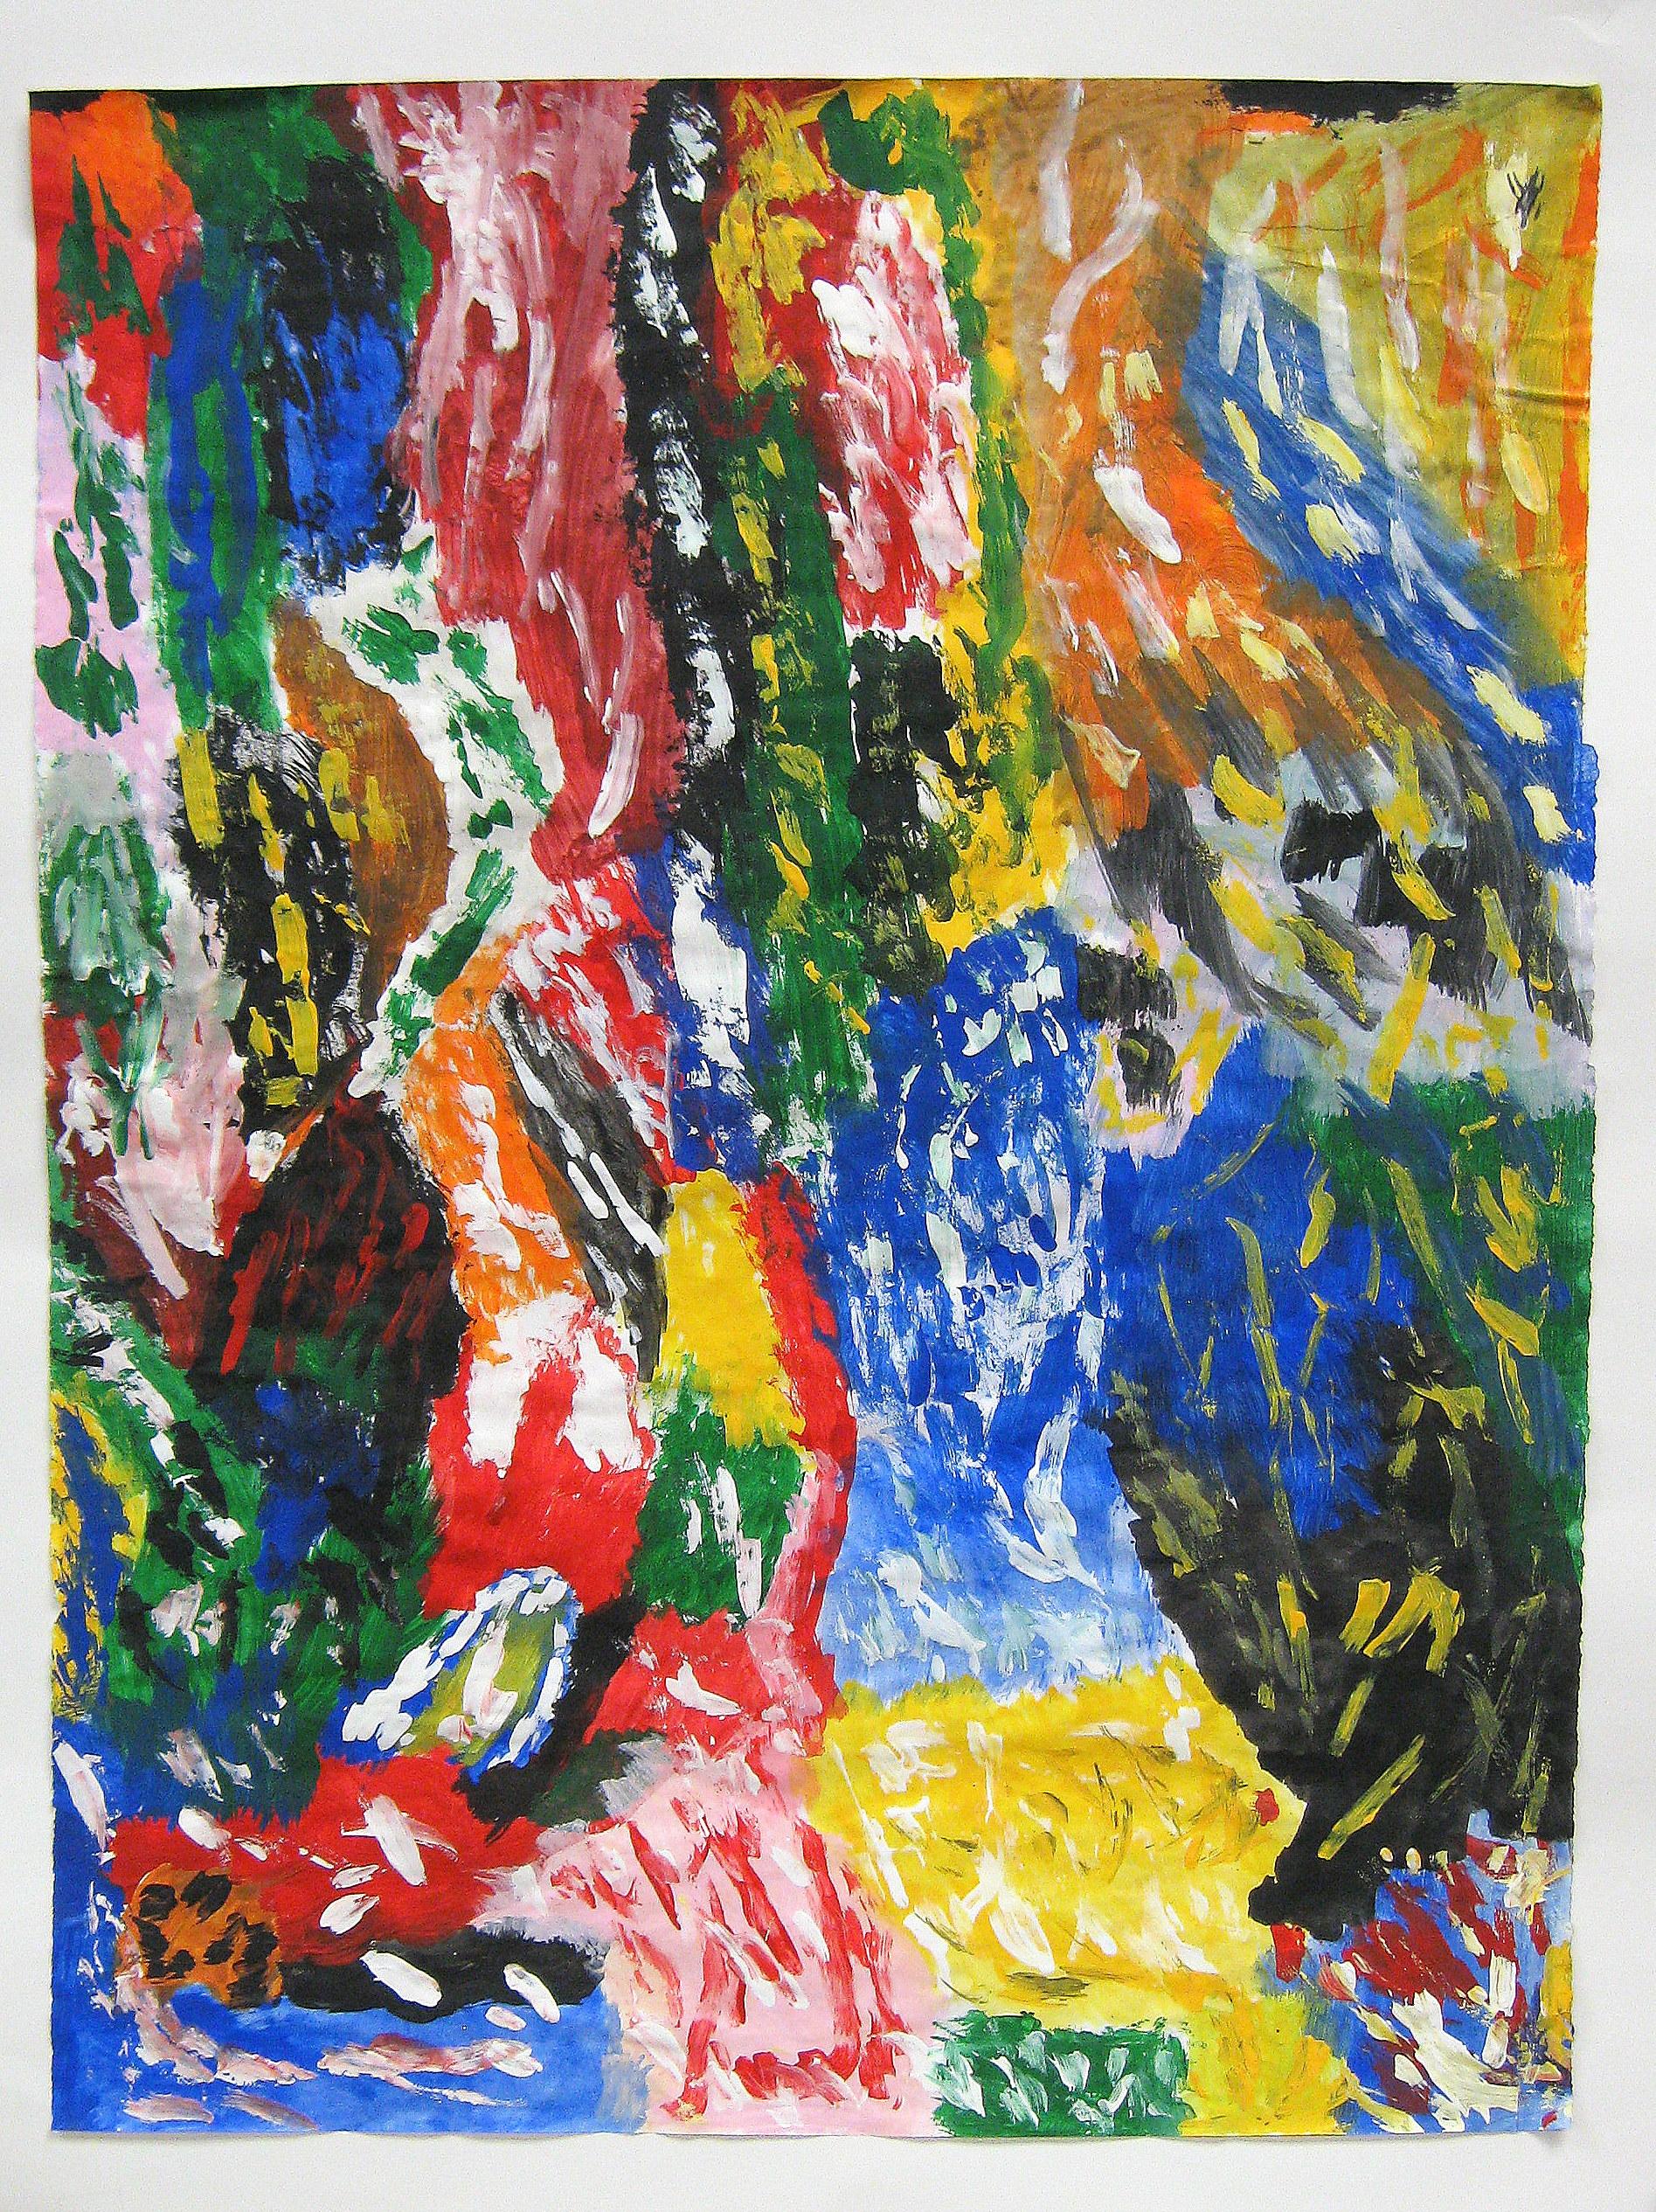 Abstract Six $30/print, $150/original Acrylic on Paper 16 x 22